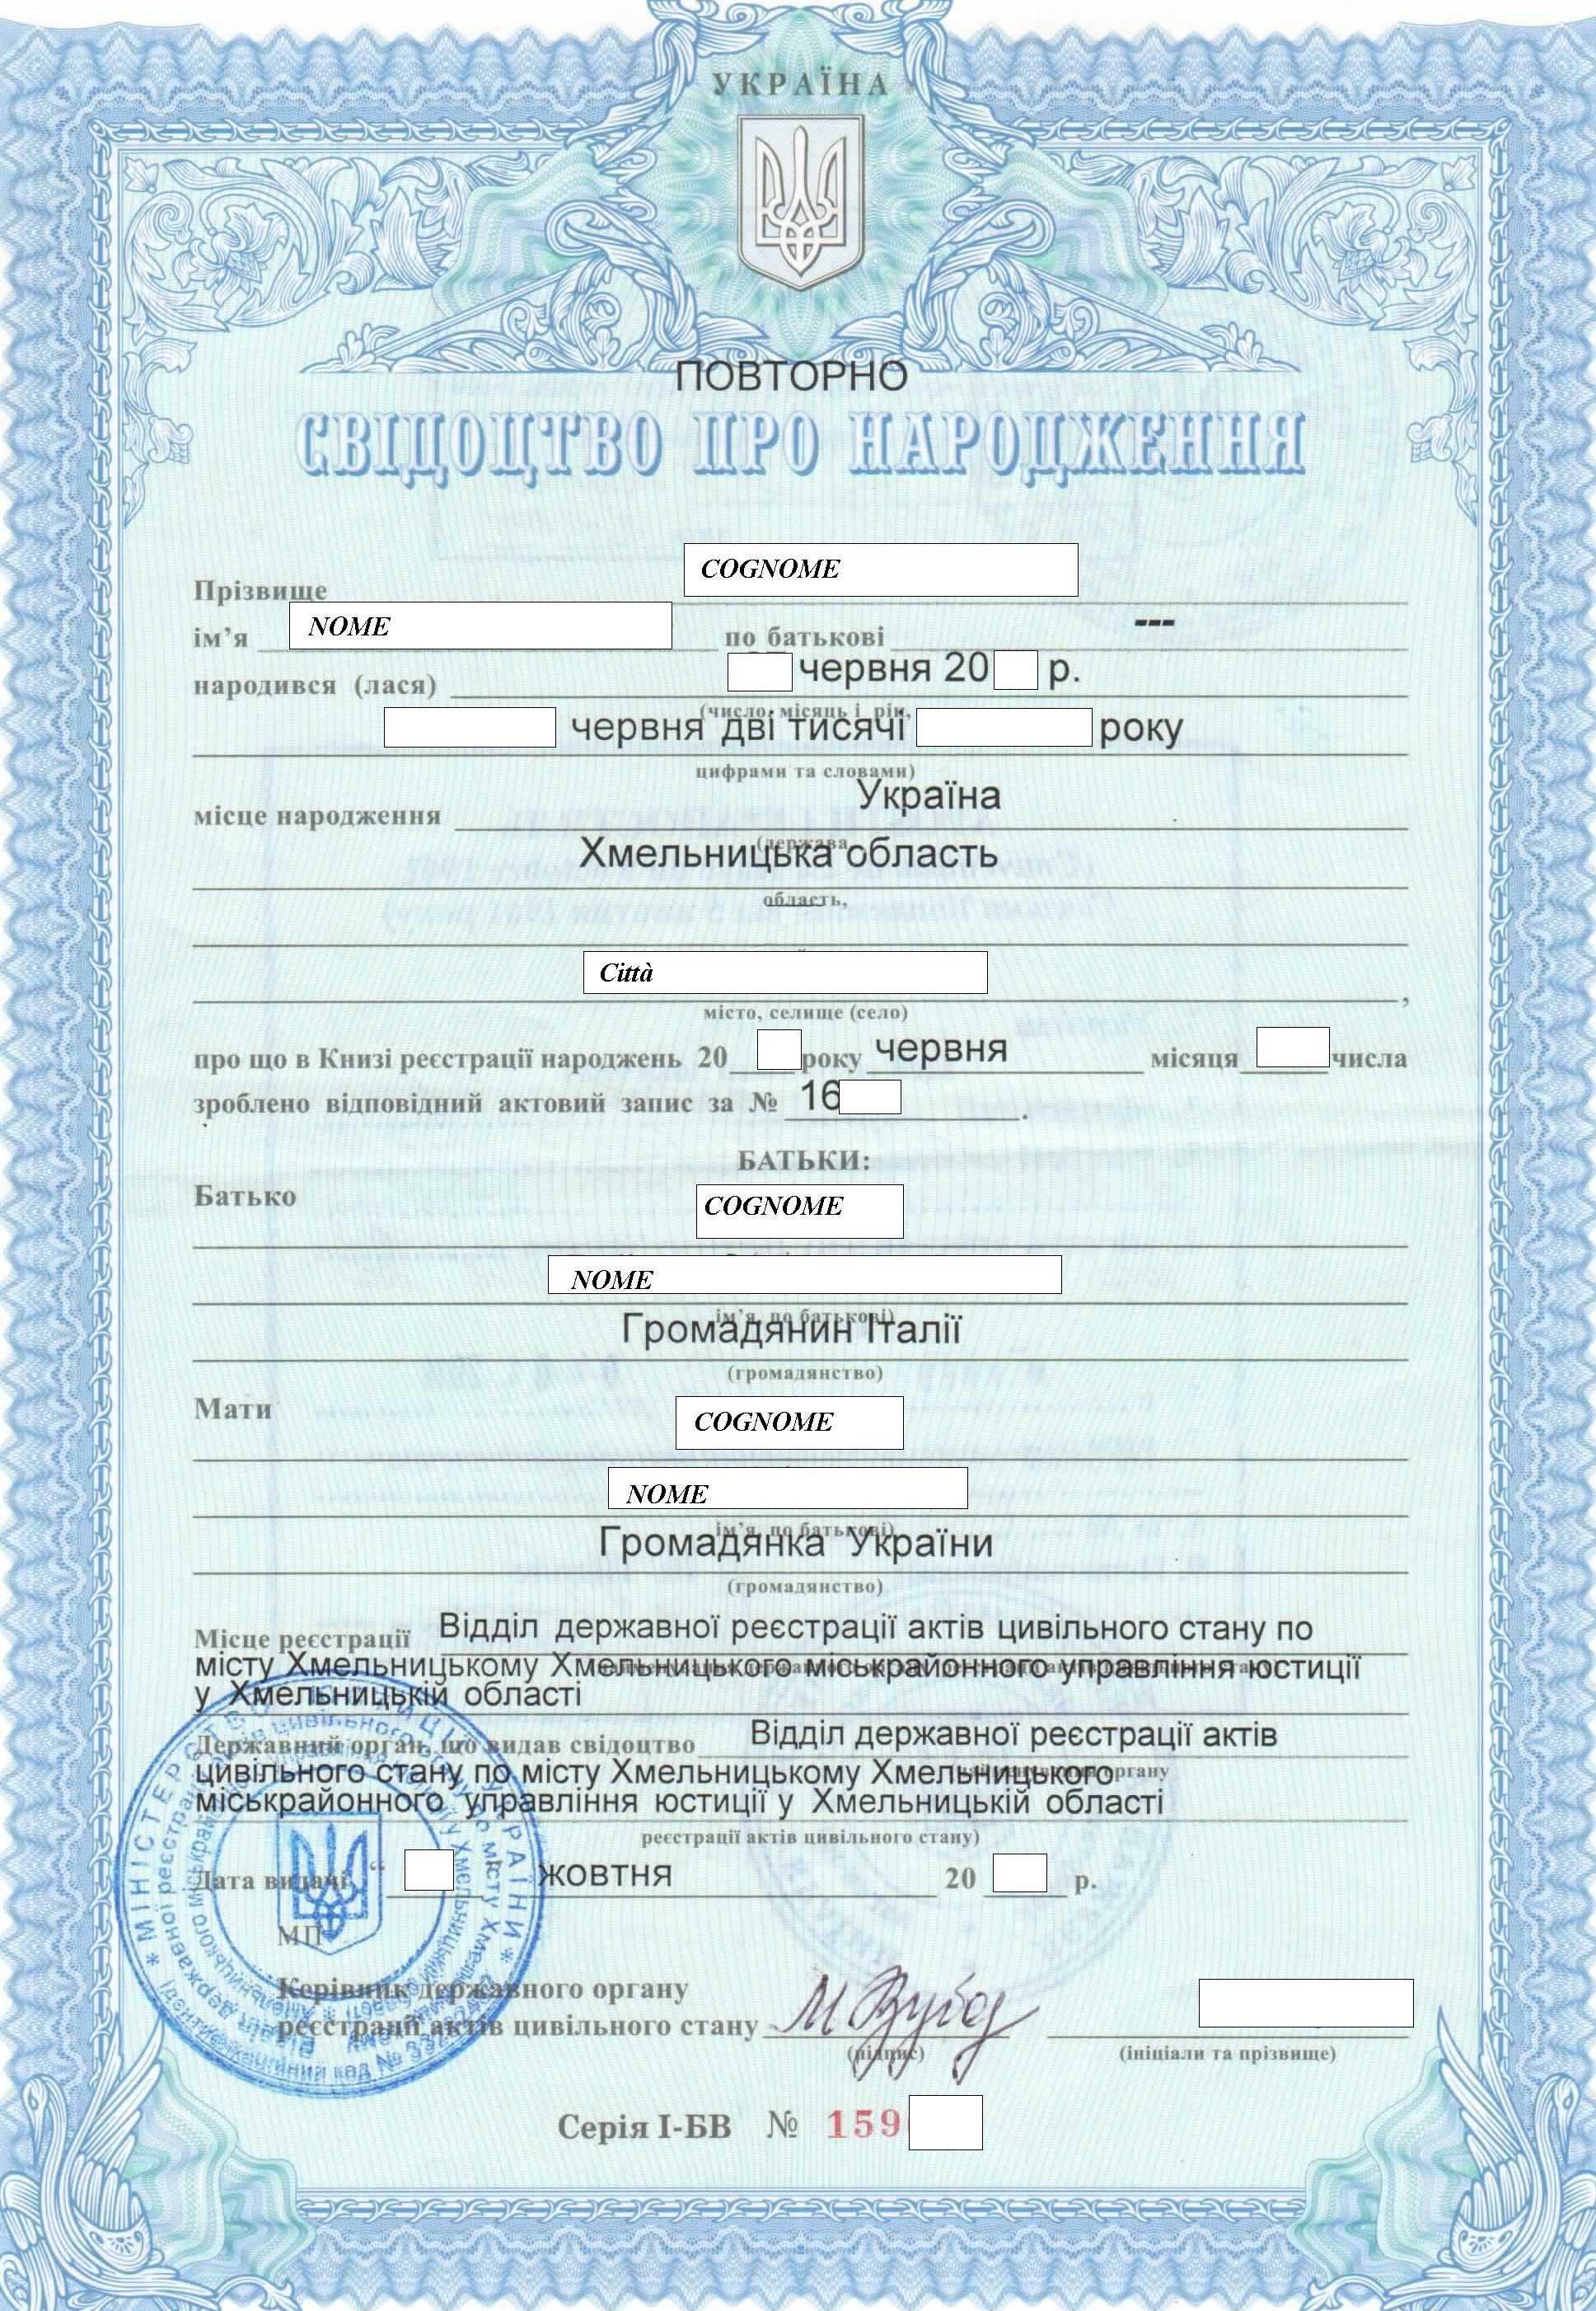 agenzia matrimoniale certificato di nascita ucraina